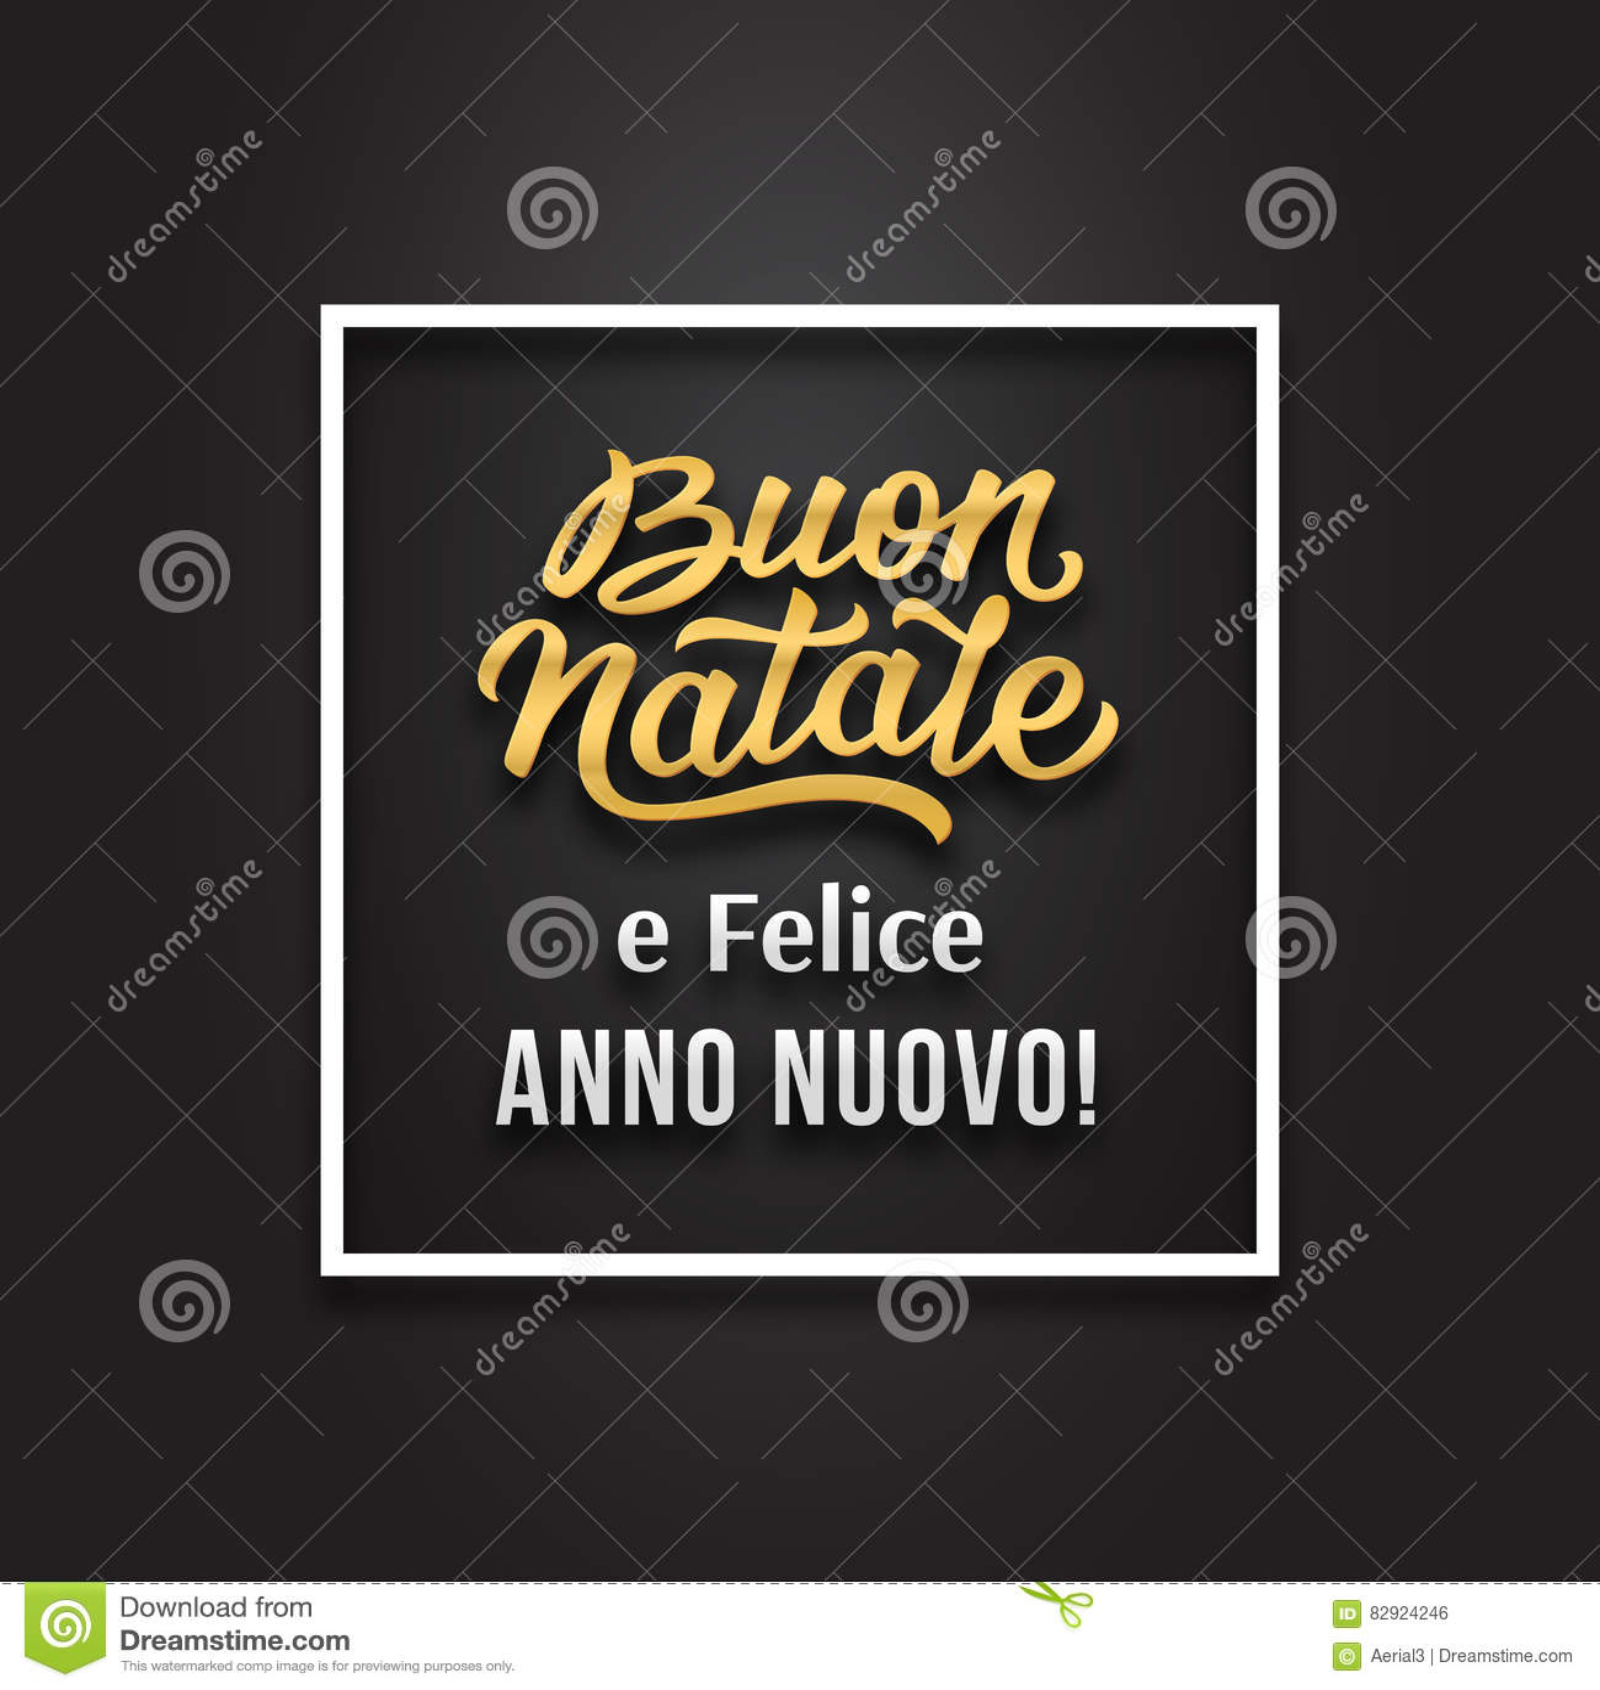 Merry christmas and happy new year in italian stock vector merry christmas and happy new year in italian m4hsunfo